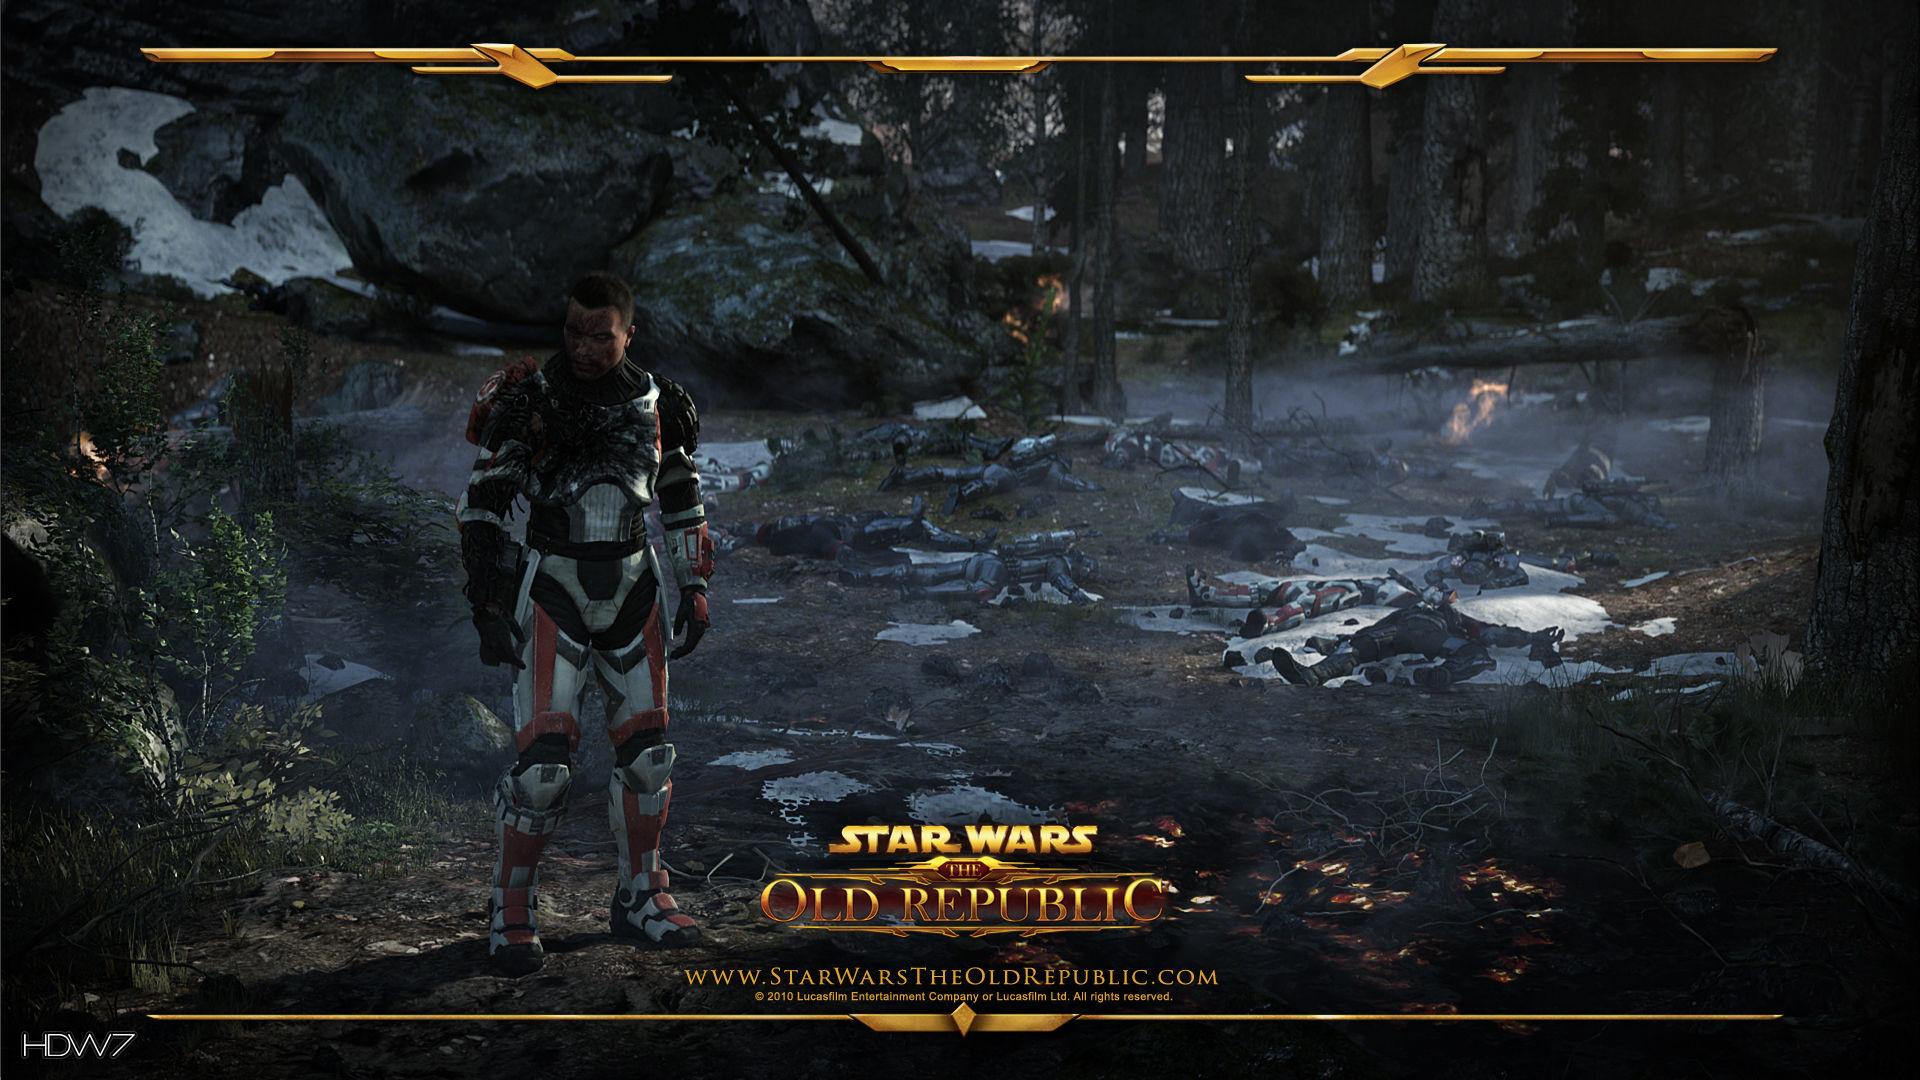 star wars the old republic last trooper standing widescreen hd wallpaper